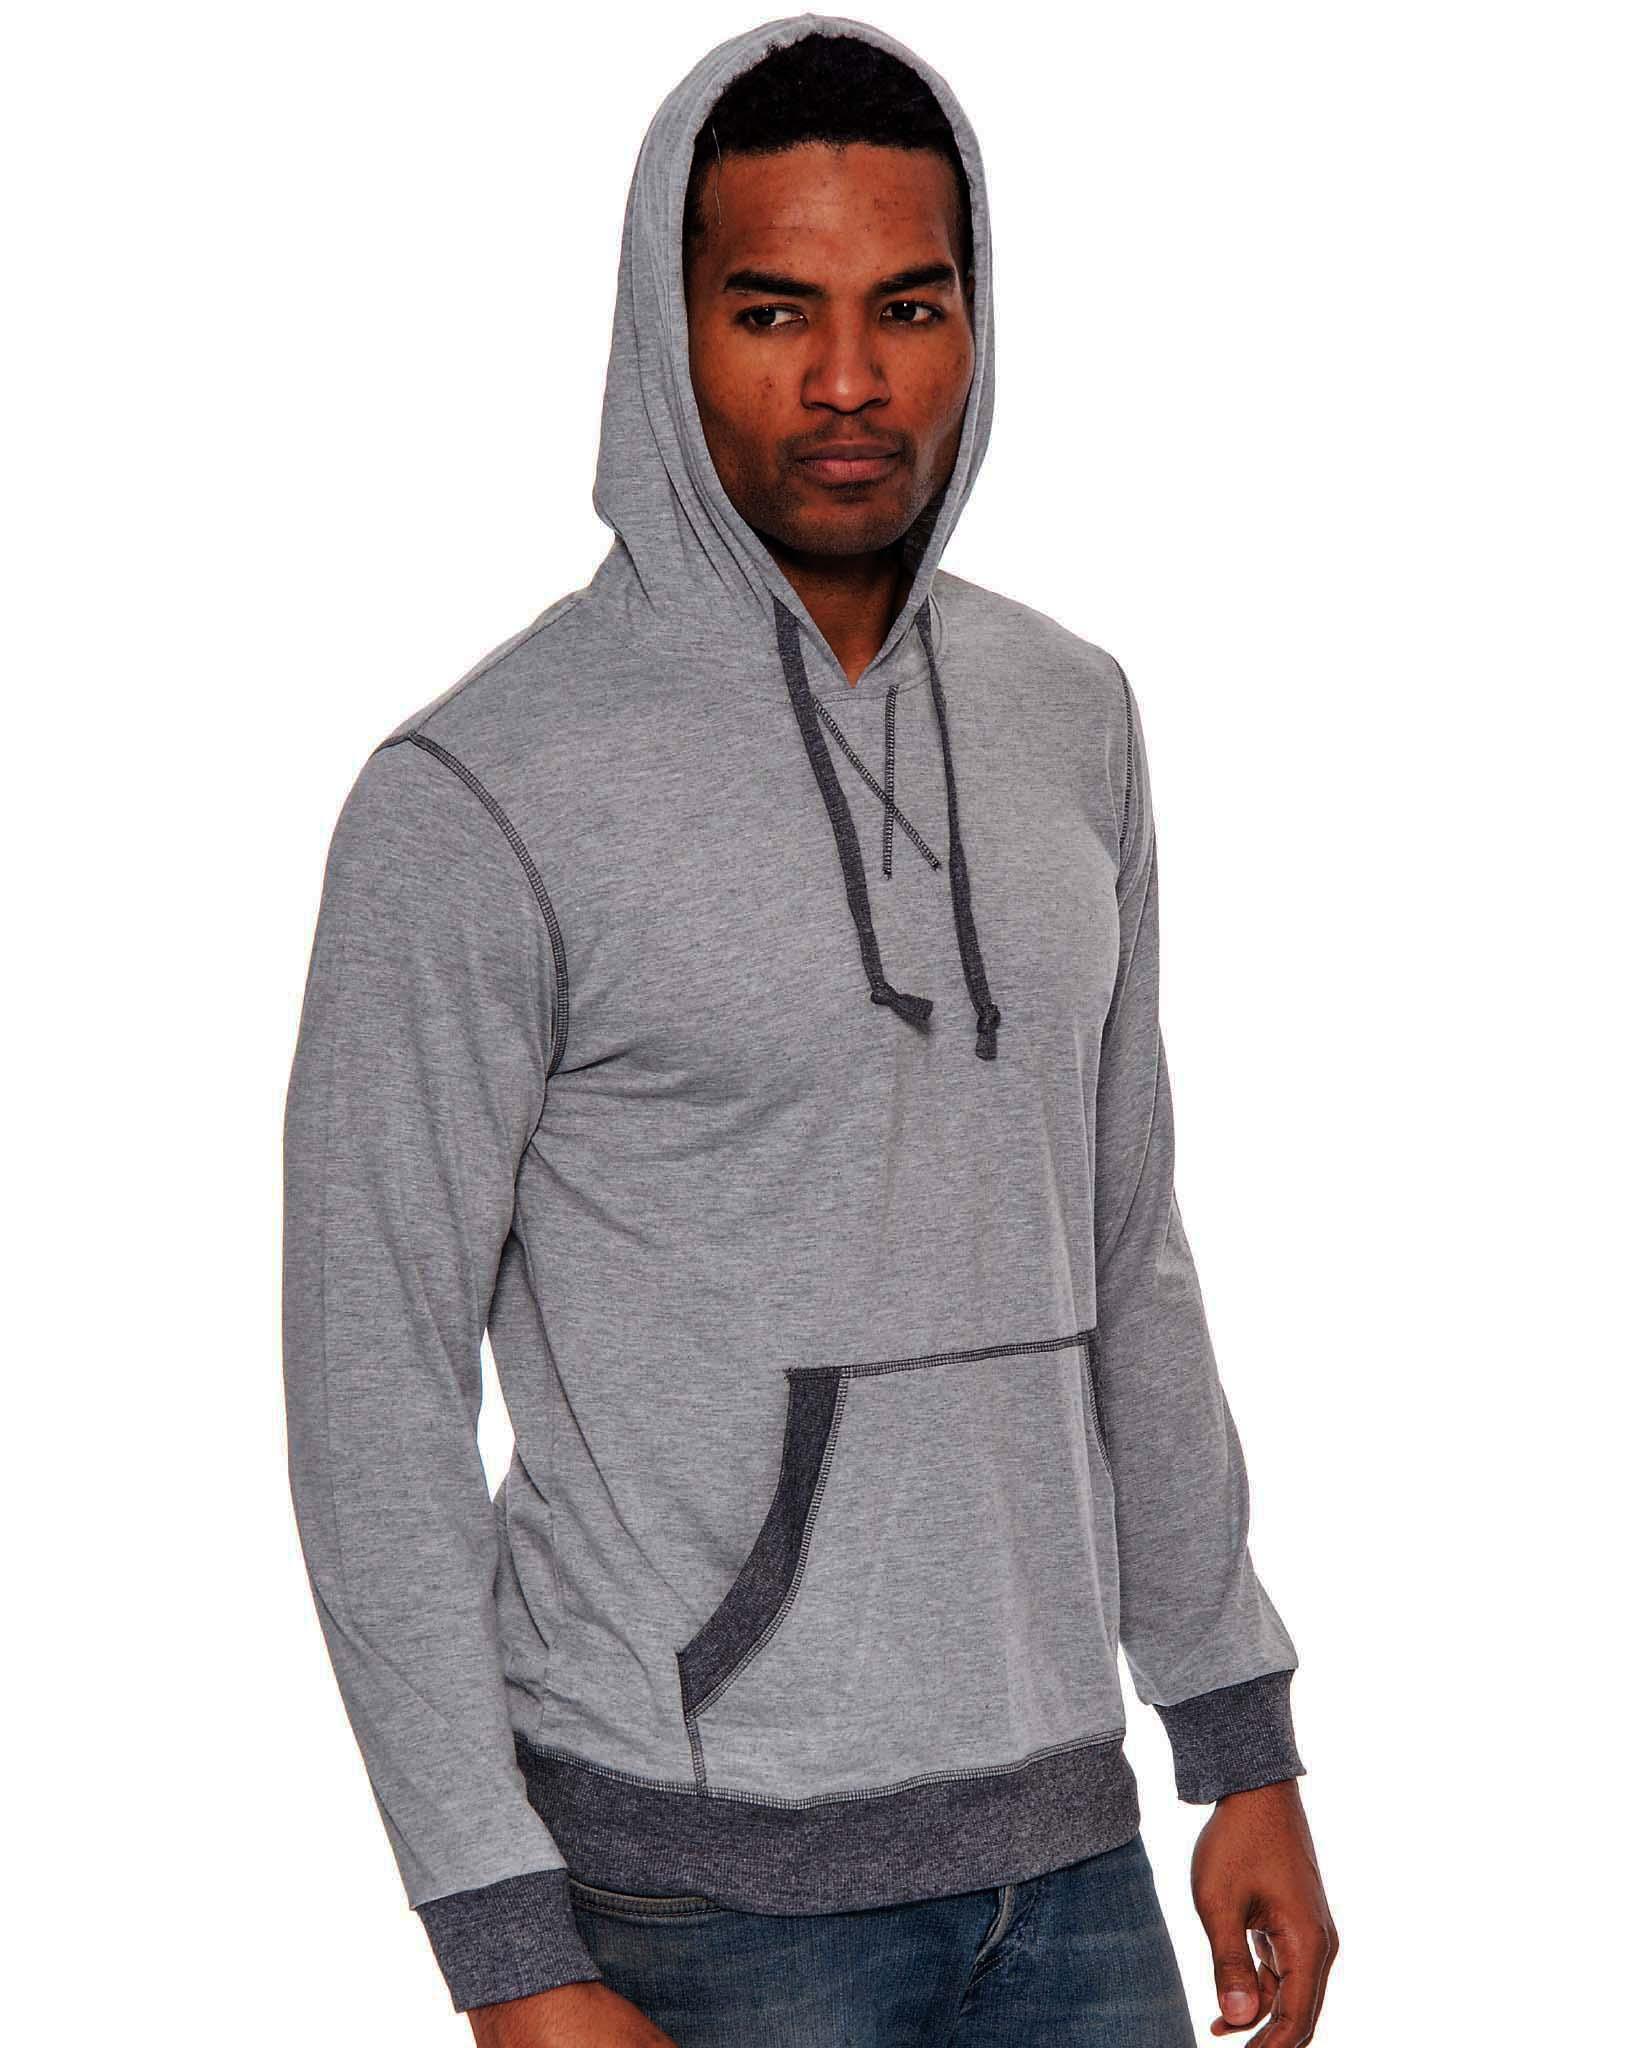 Lightweight hoodies for men